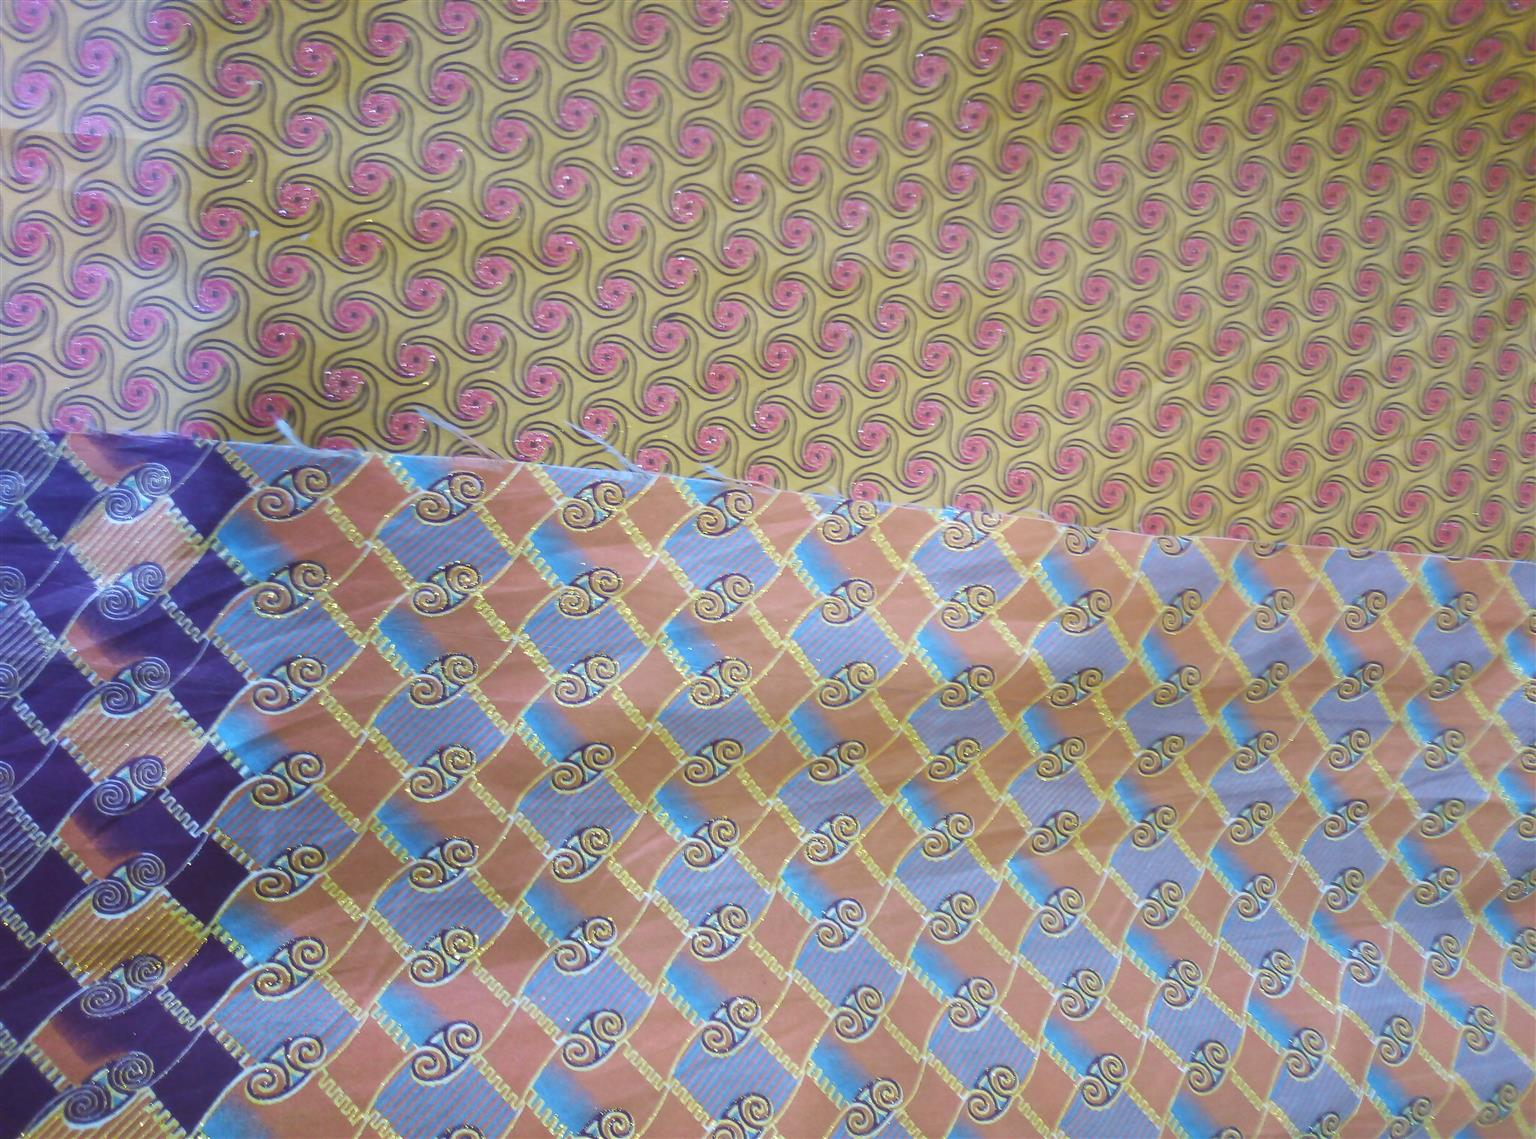 Metallic wax prints